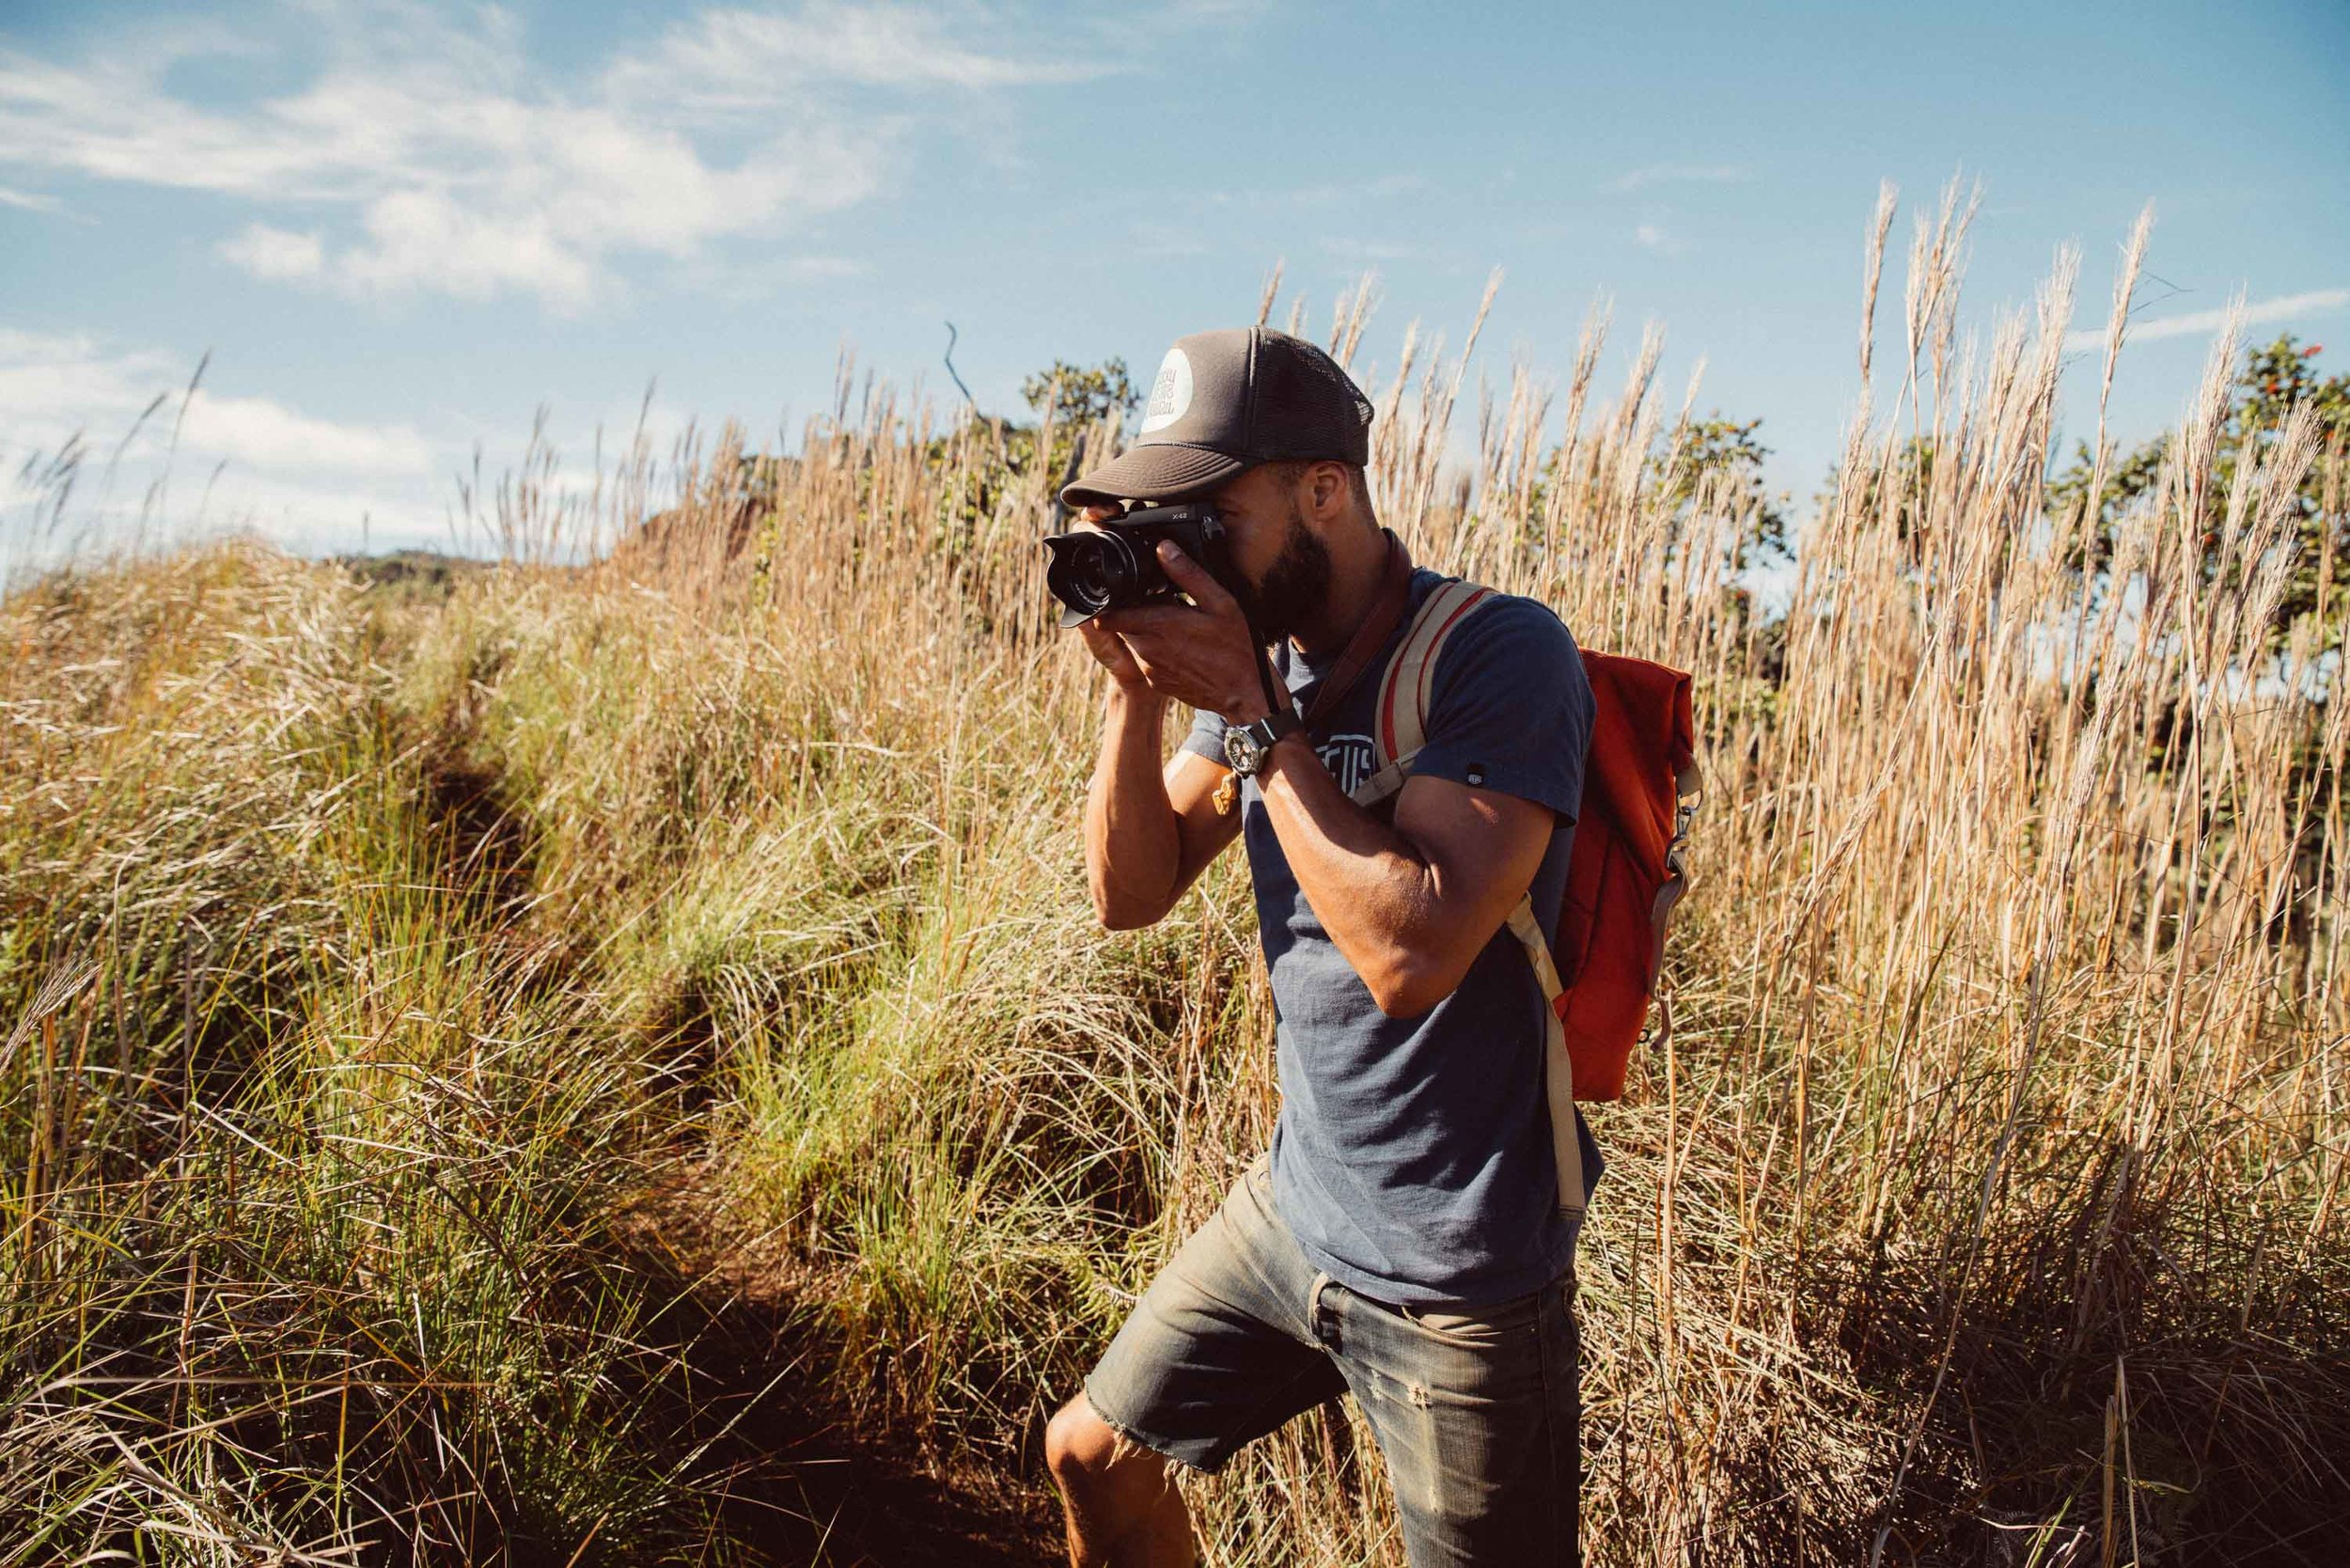 bryce-johnson-kalalau-ridge-kauai-hiking-hammock-palmwood-aloha-exchange-4.jpg